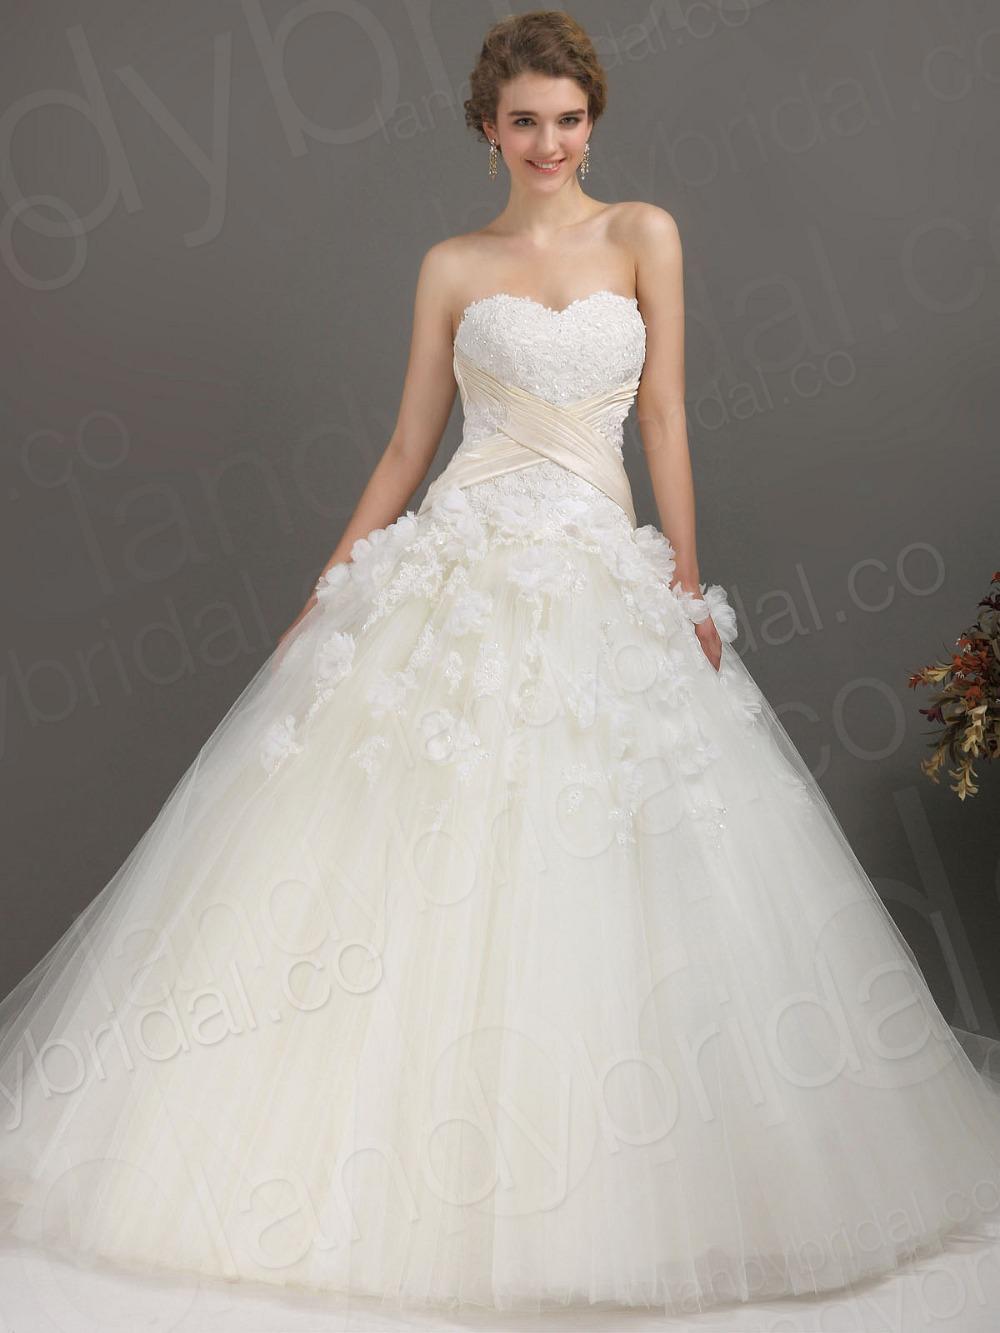 Wedding dresses shipped quick flower girl dresses for Wholesale wedding dresses los angeles